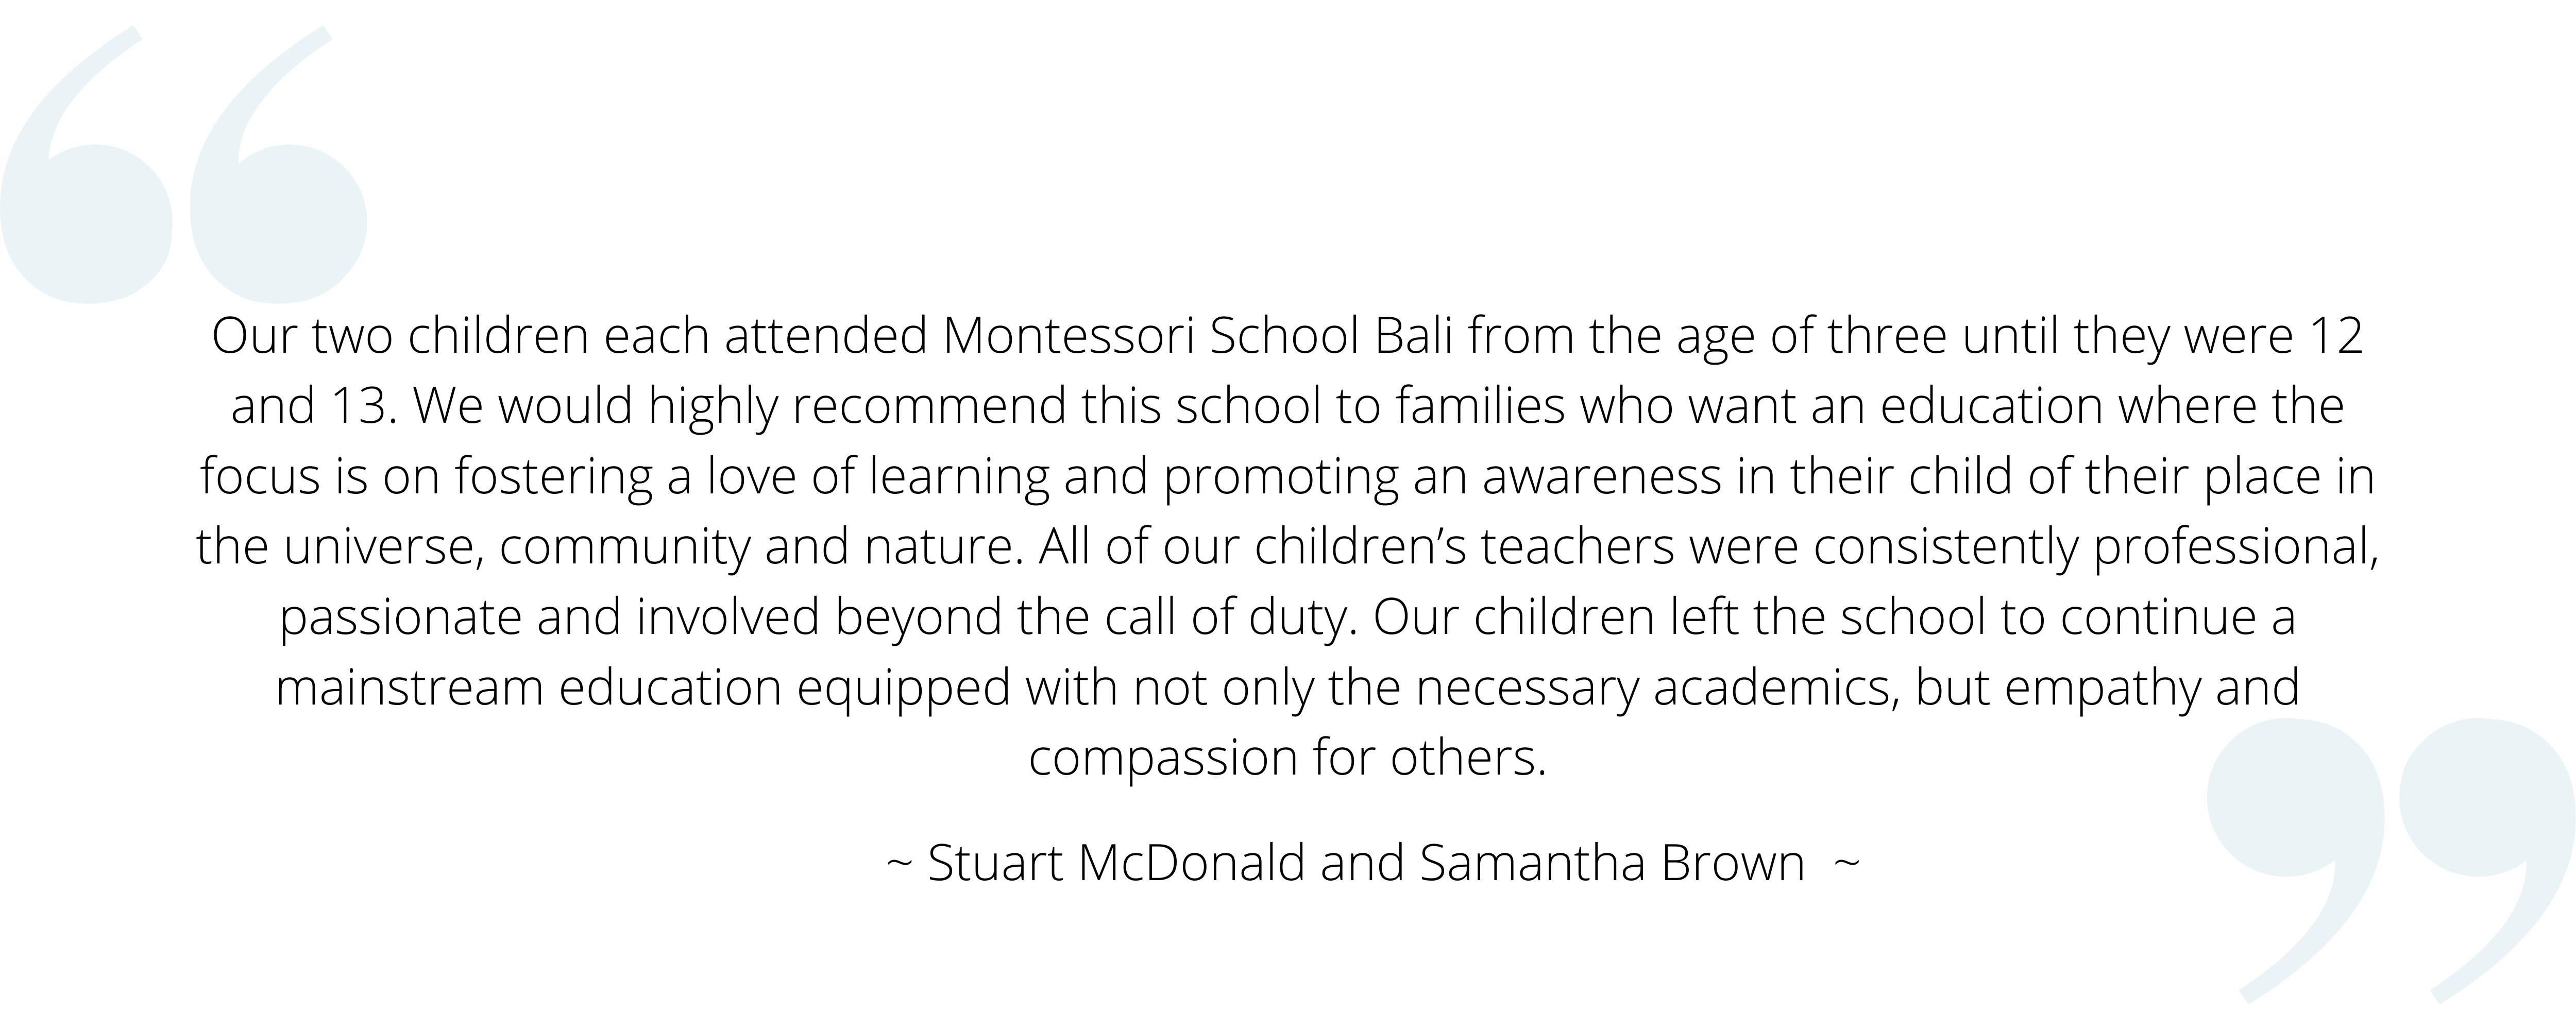 Montessori School Bali Testimonial